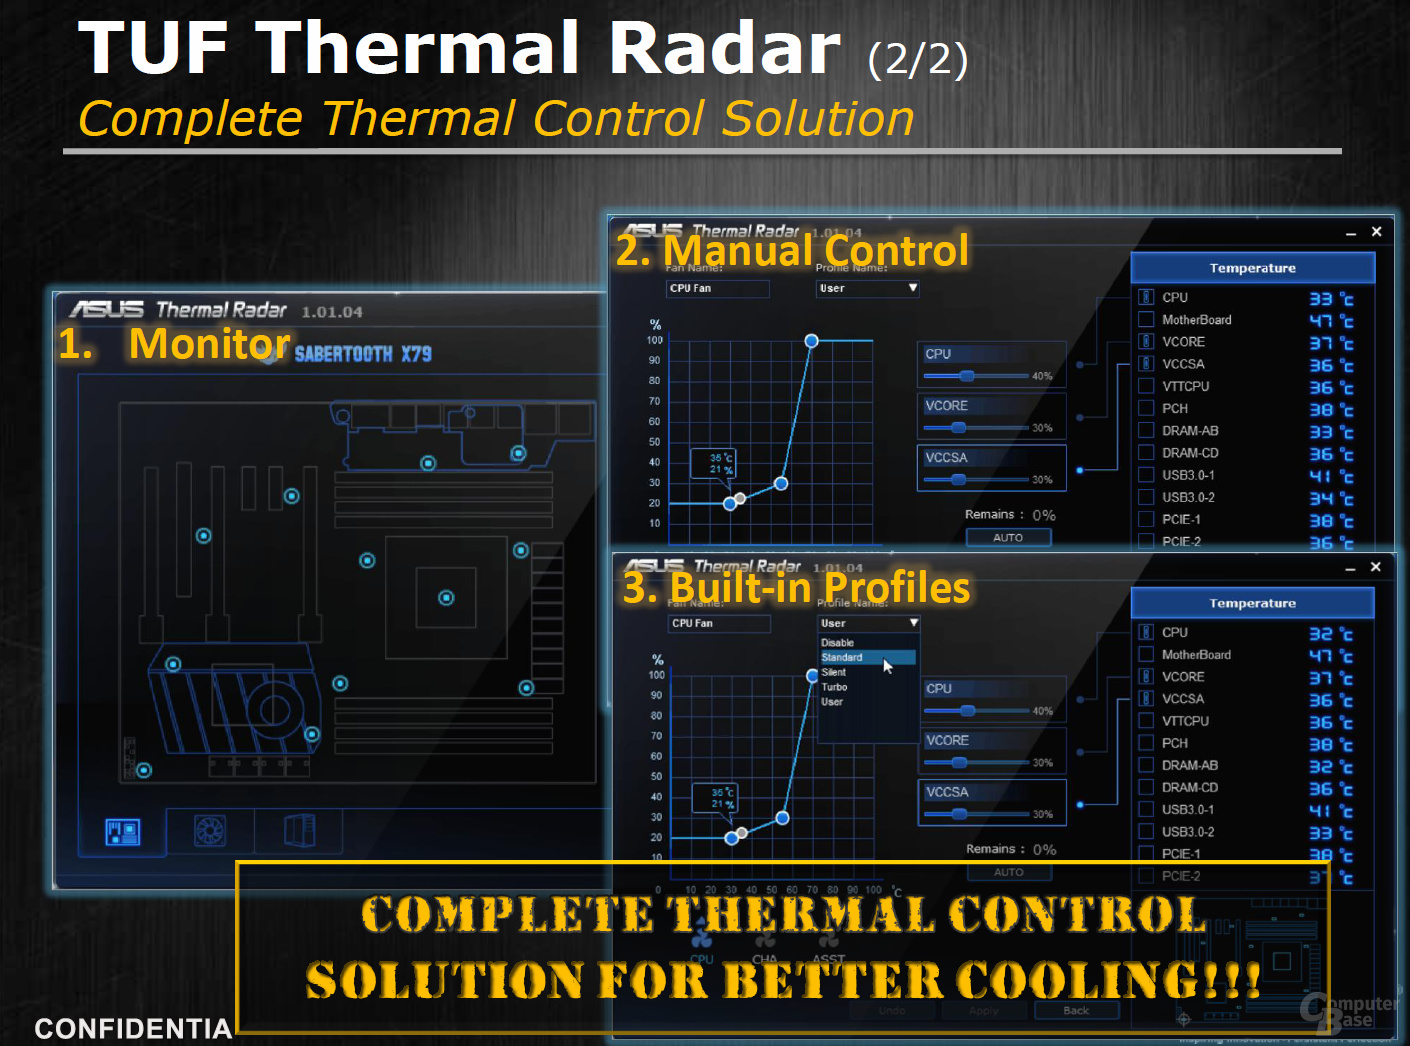 TUF Thermal Radar